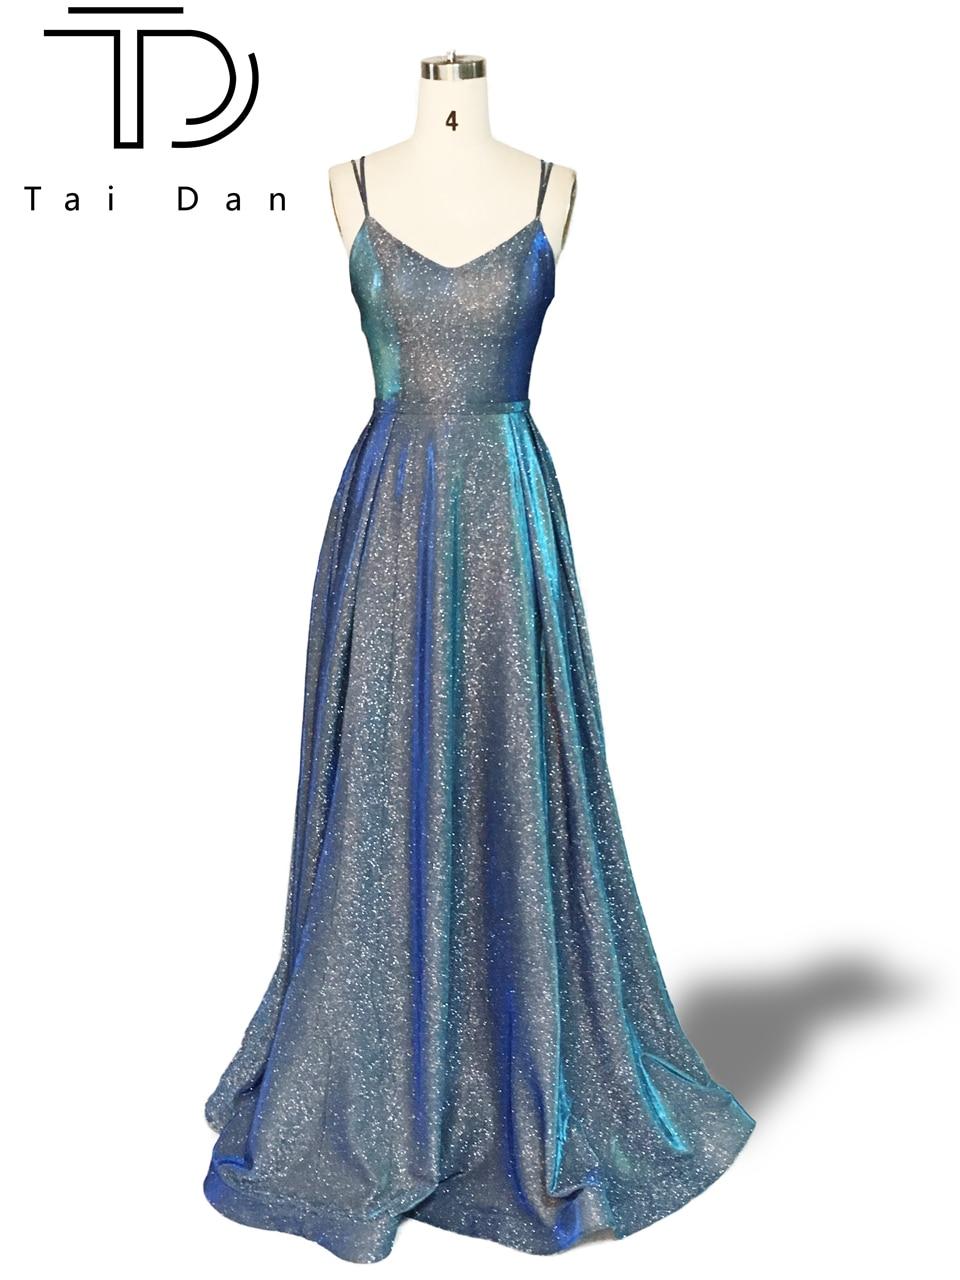 Gorgeous Prom Dress A-line Deep V-neck Sleeveless Formal Evening Prom Dress Long Glitter Shinning Girl Prety Dress Party Gown